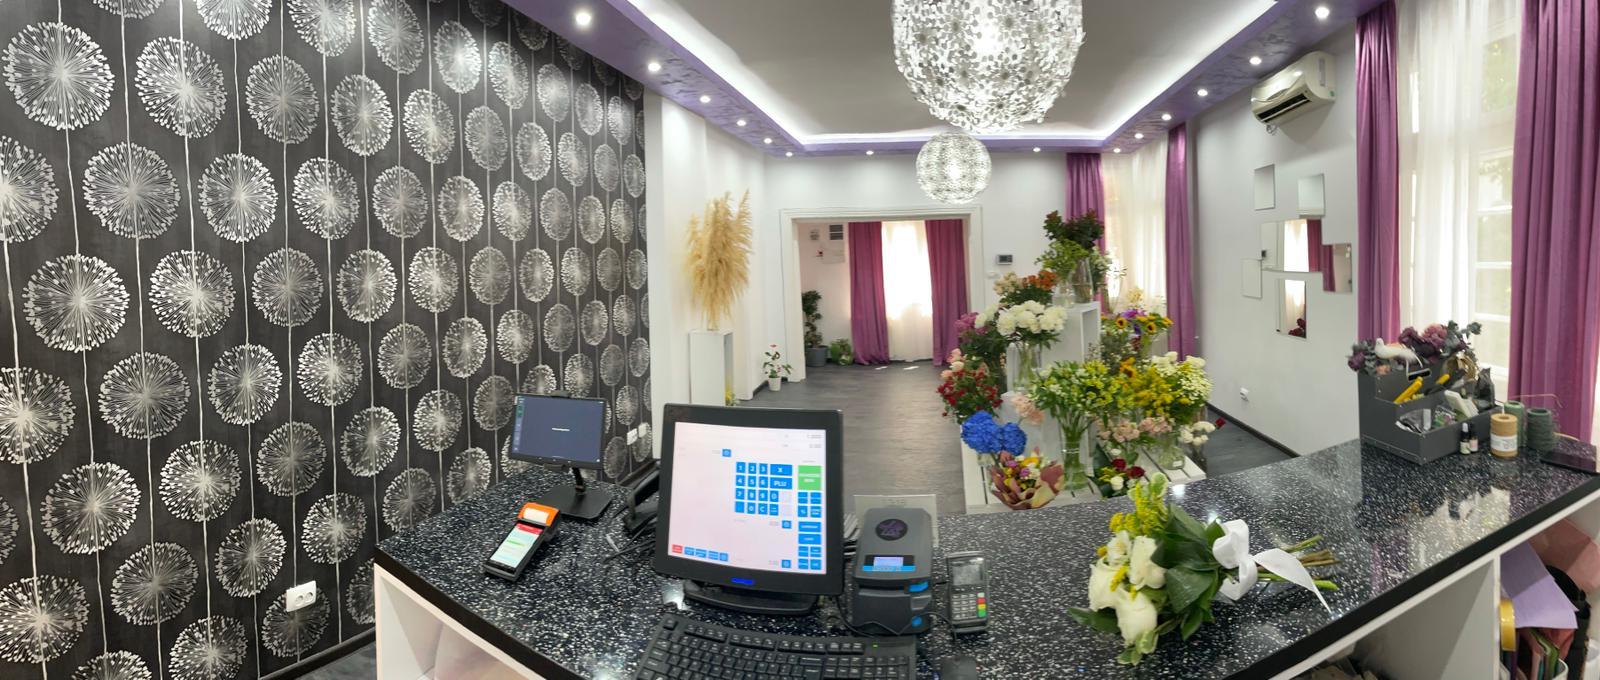 Gestiune Atelier Floral Velvet